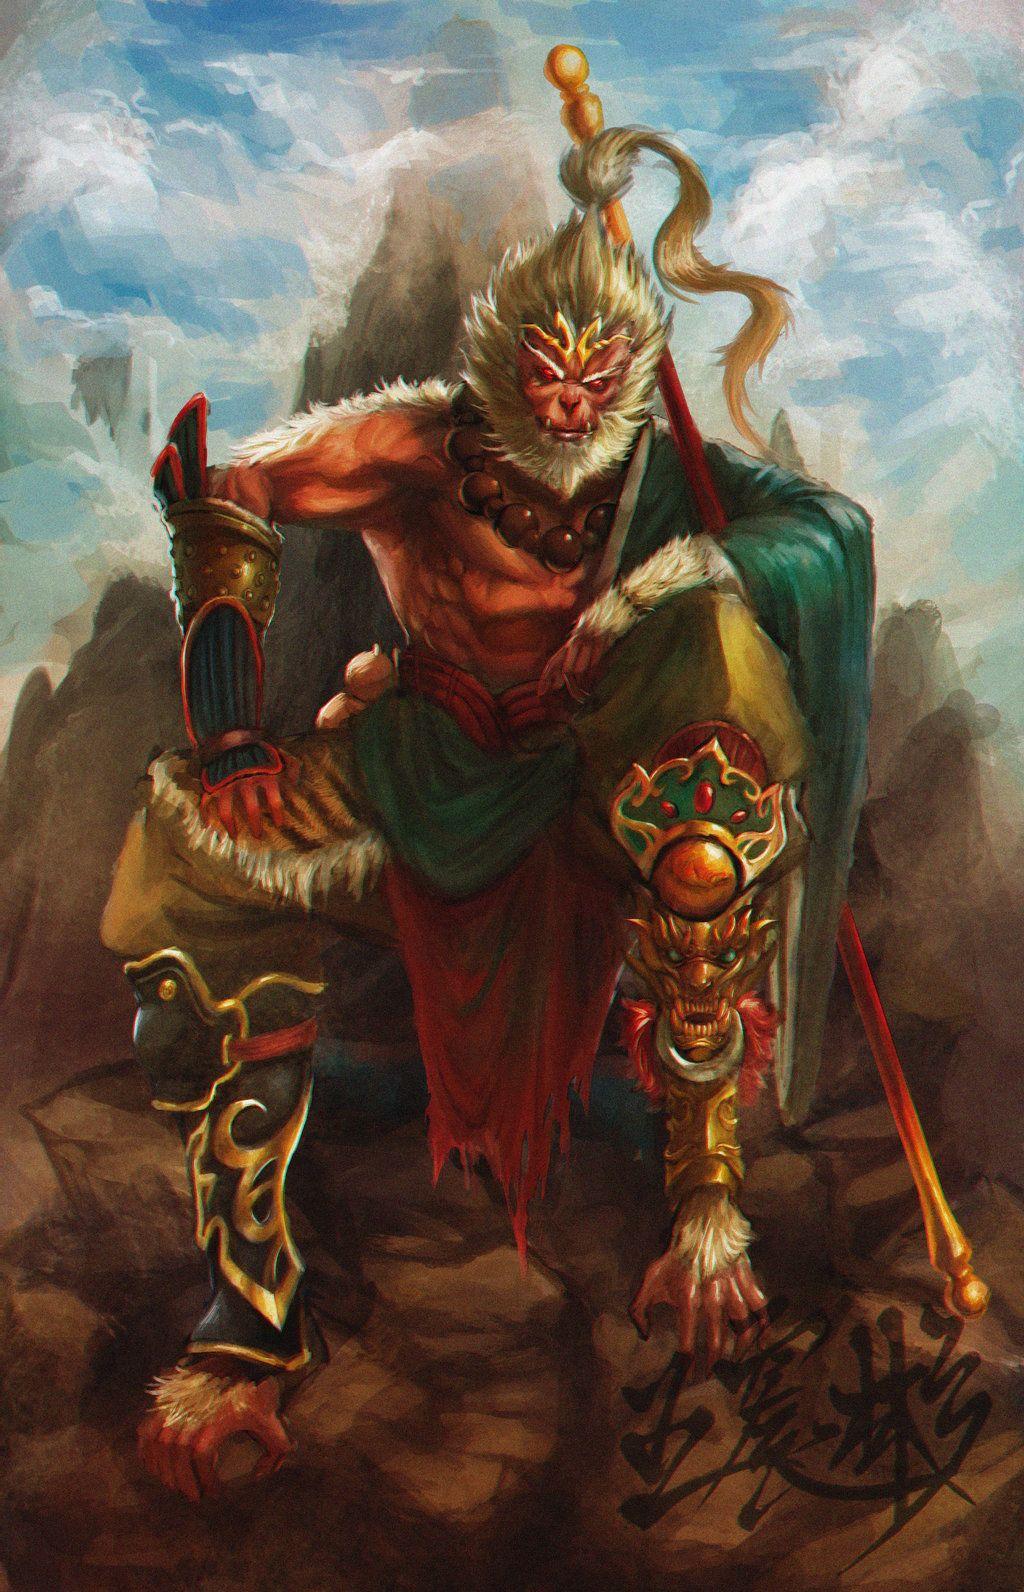 Sun Wukong(Monkey King) VS. Marvel Gods - Battles - Comic ...